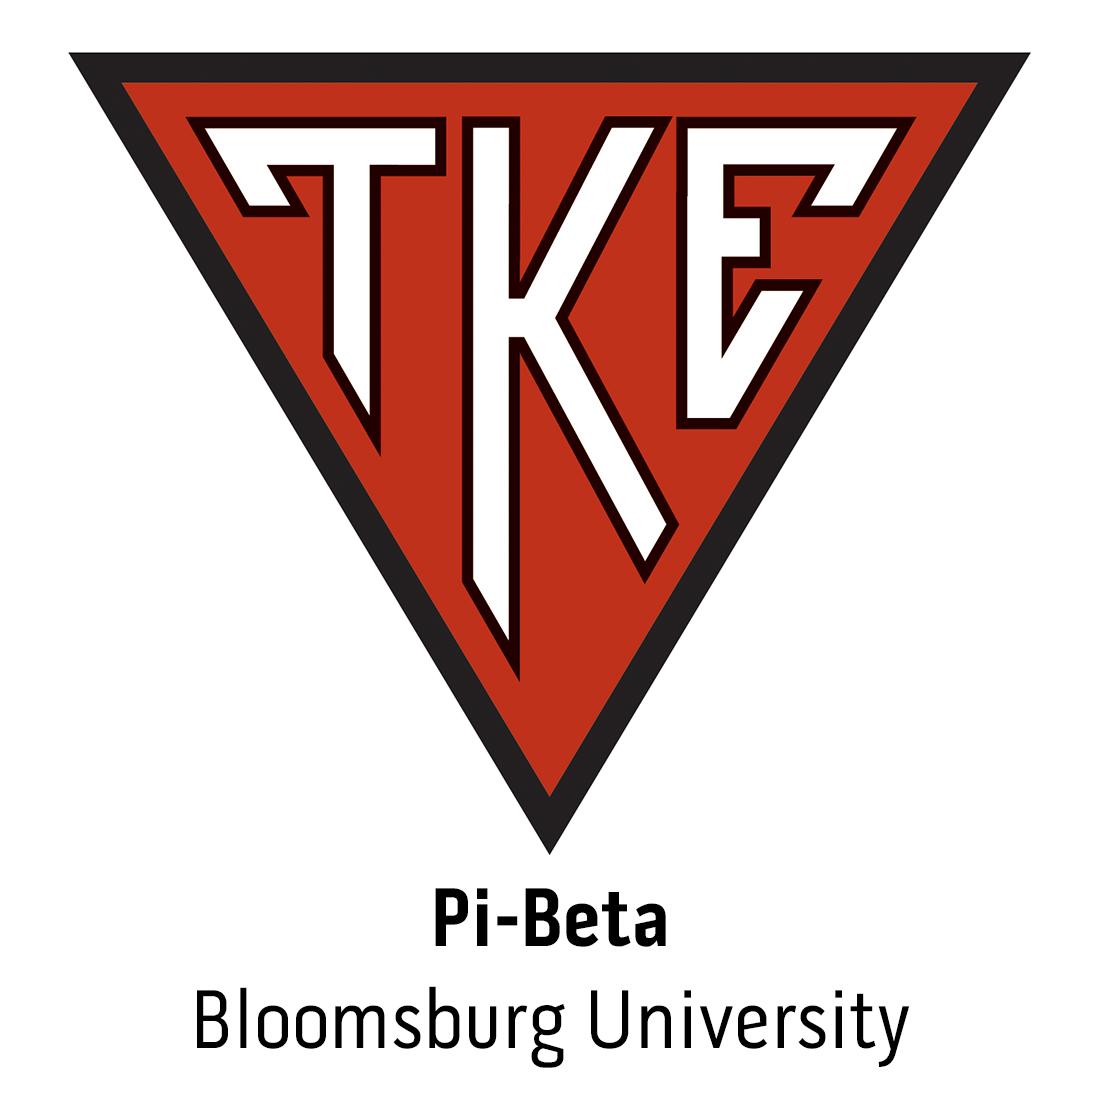 Pi-Beta Chapter at Bloomsburg University of Pennsylvania